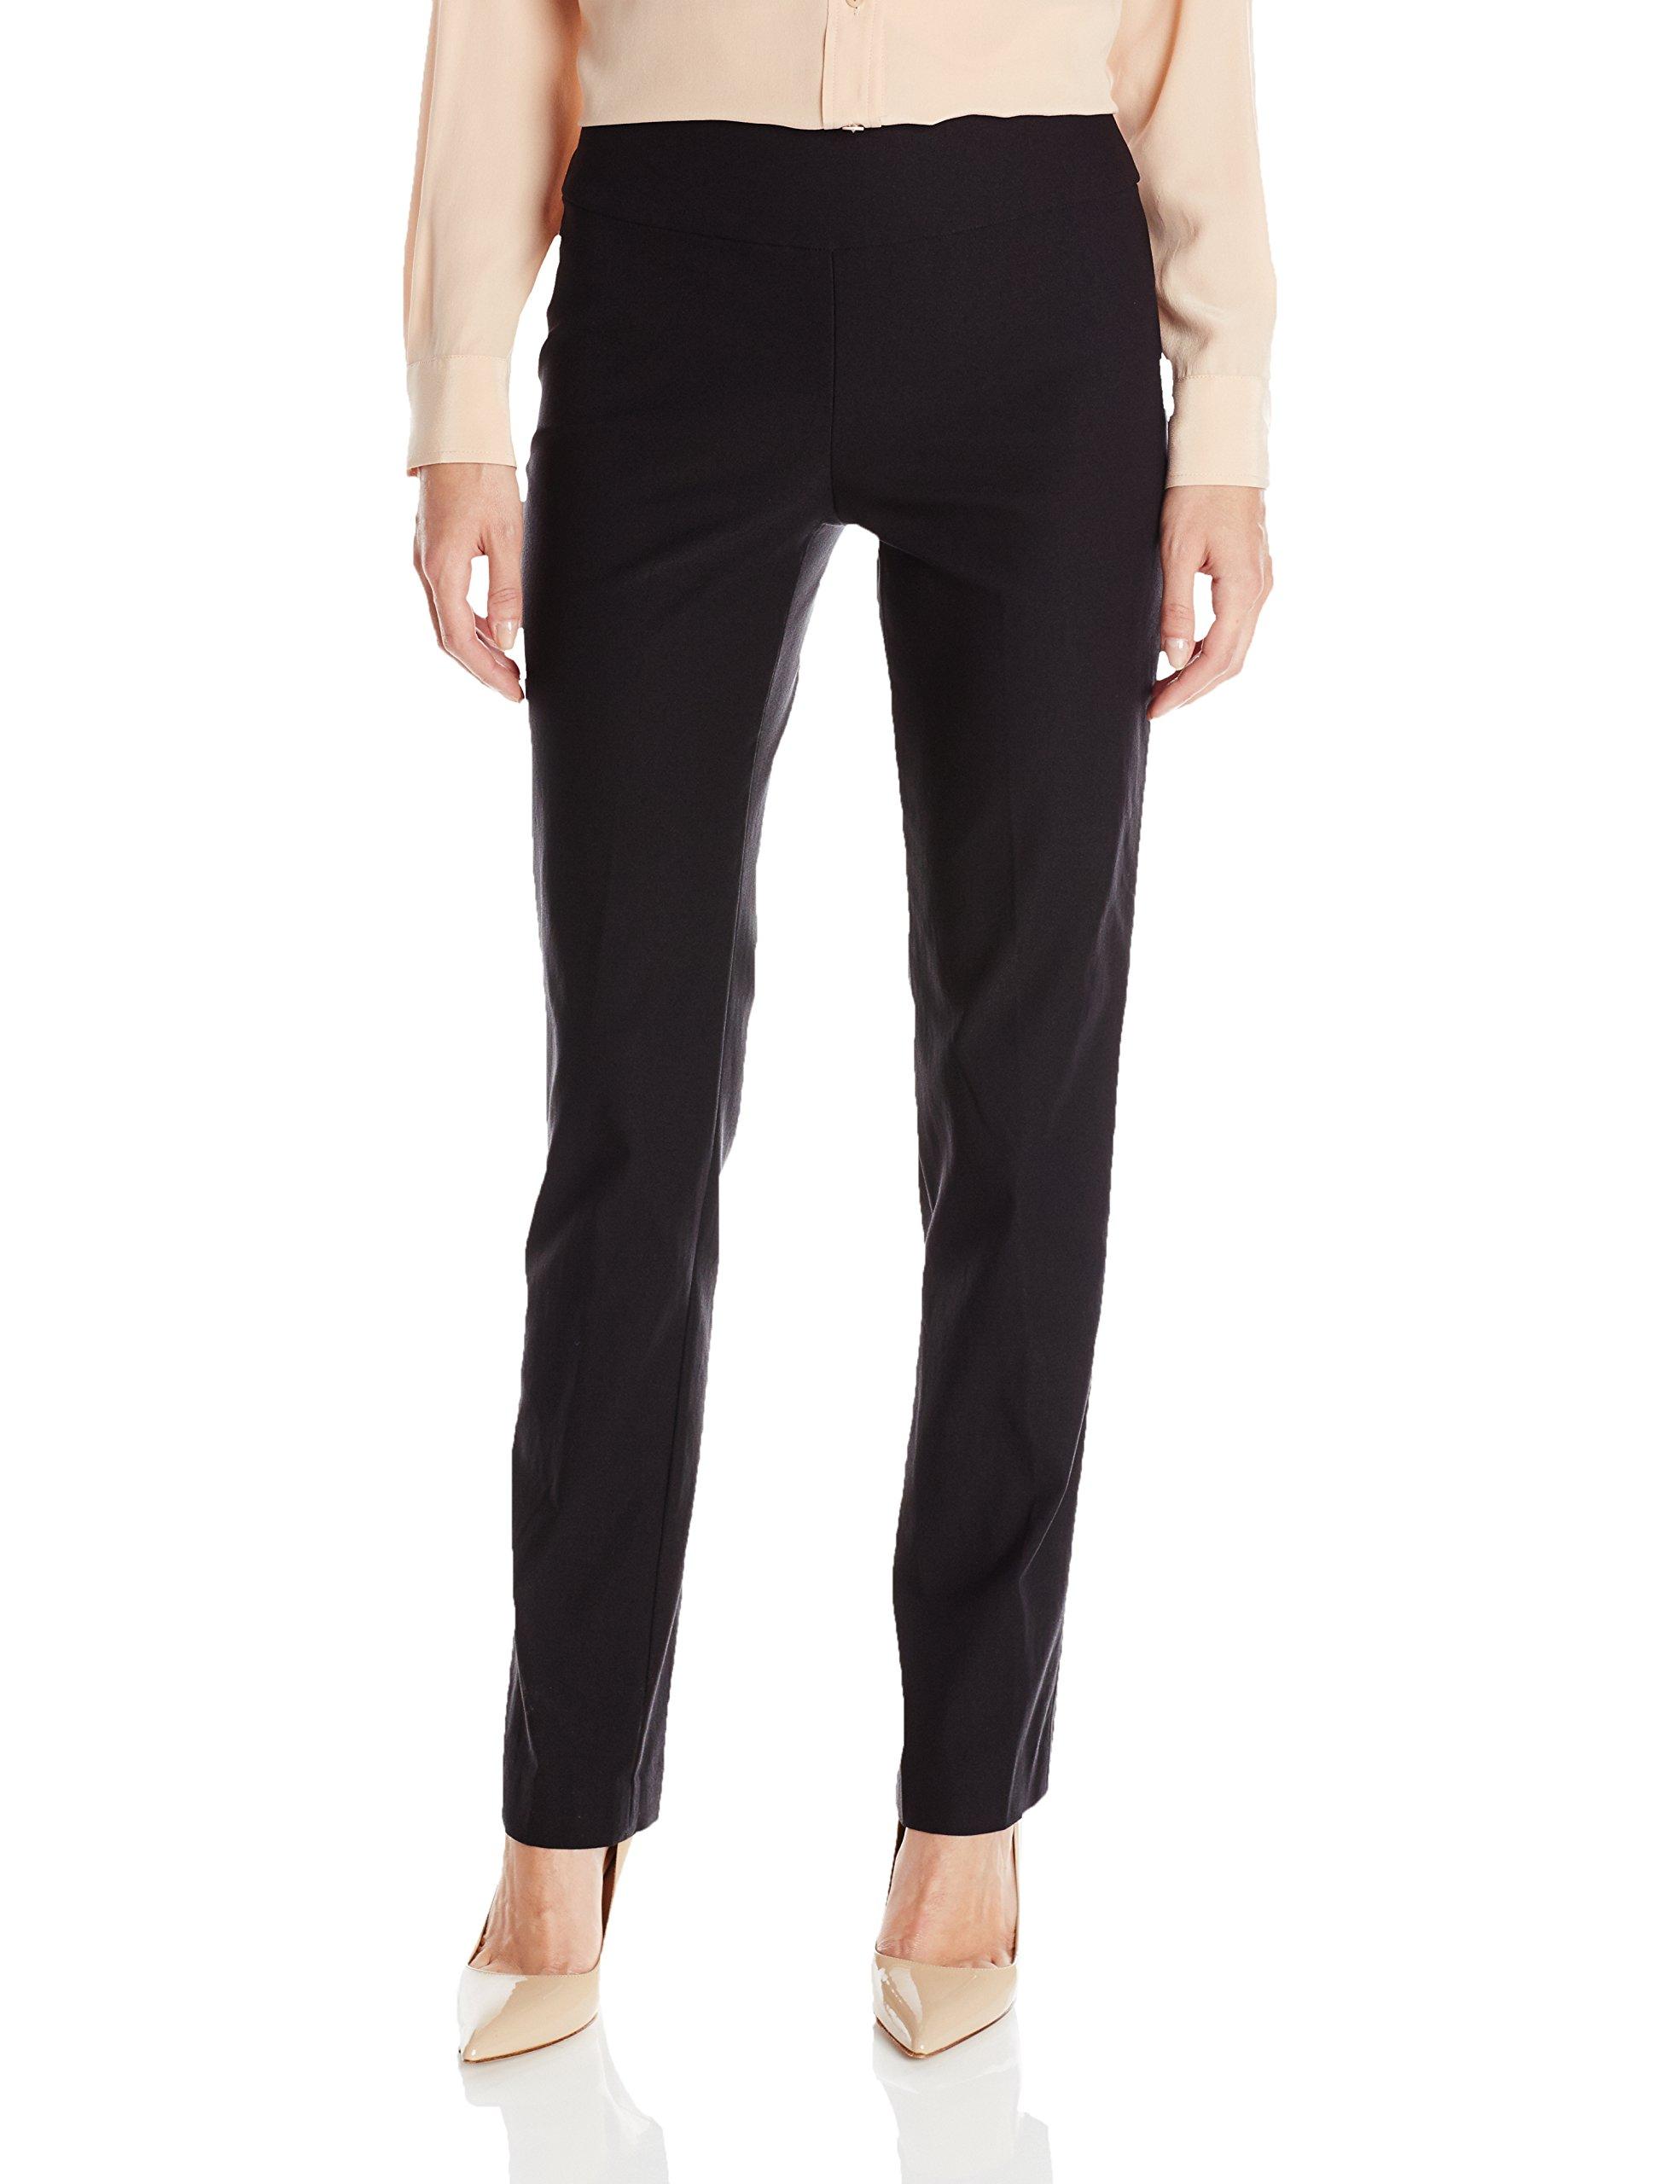 NIC+ZOE Women's Wonderstretch Pant, Black, 6 by NIC+ZOE